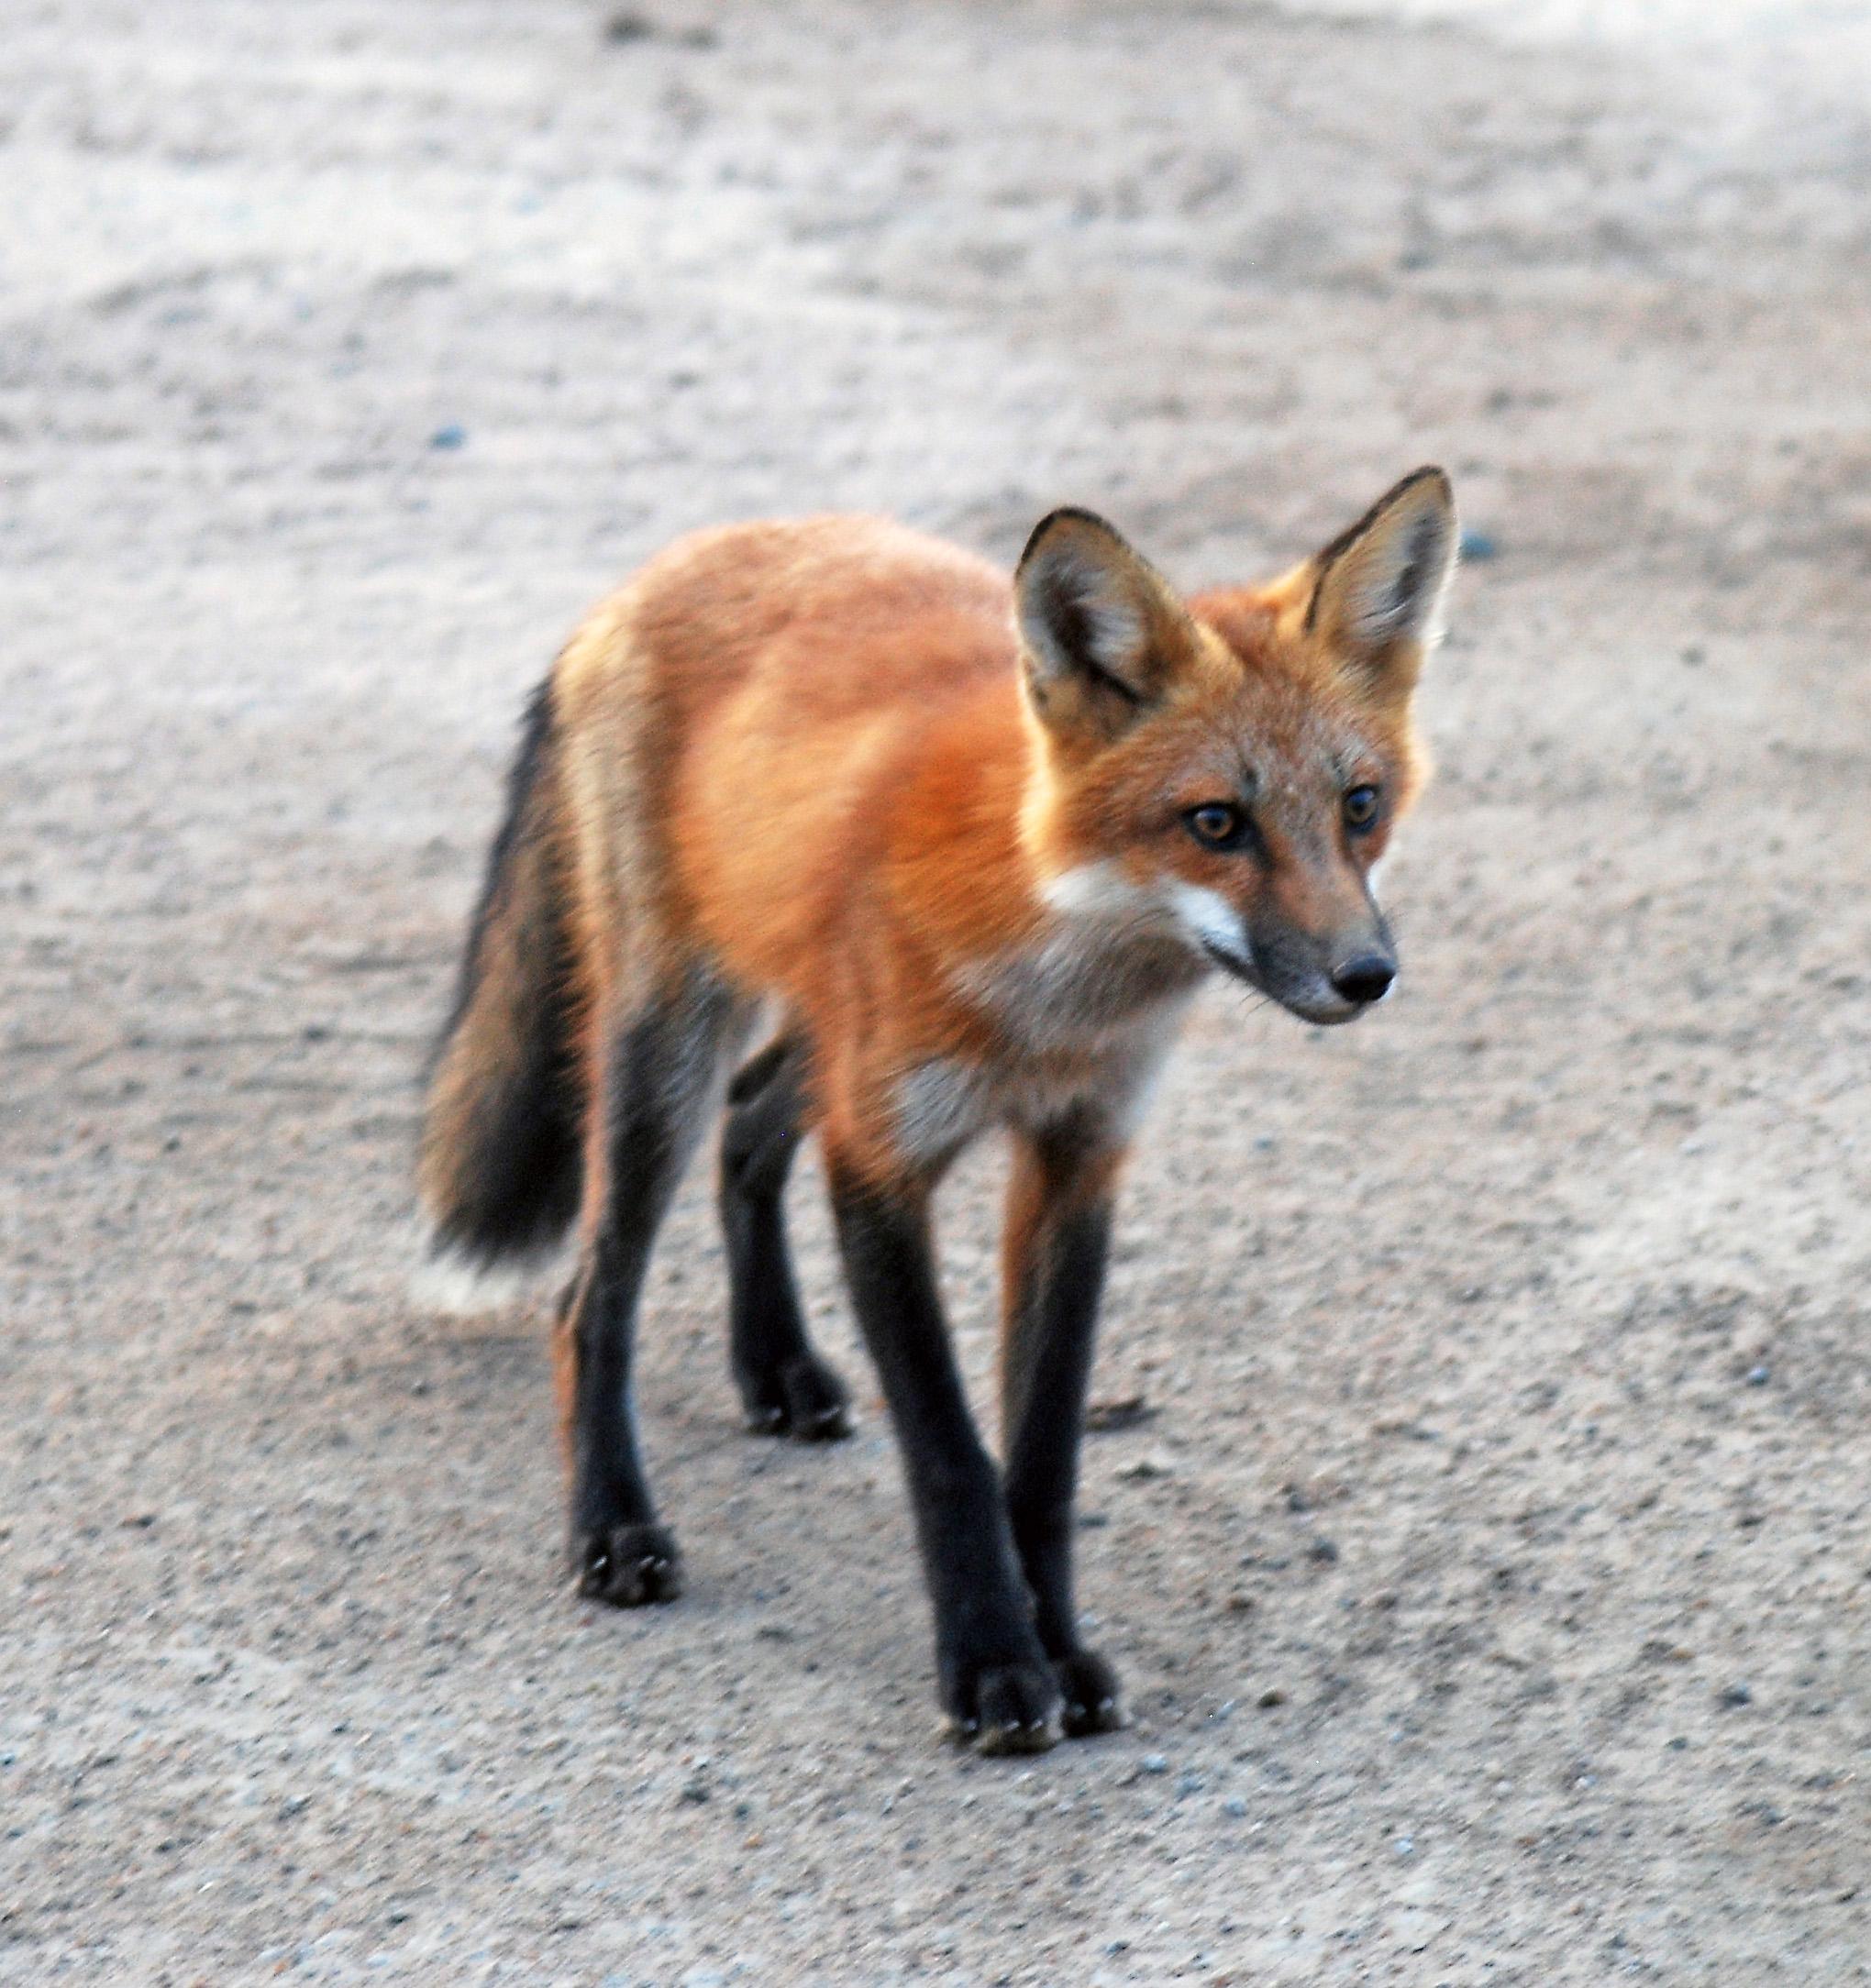 Young red fox in a junkyard